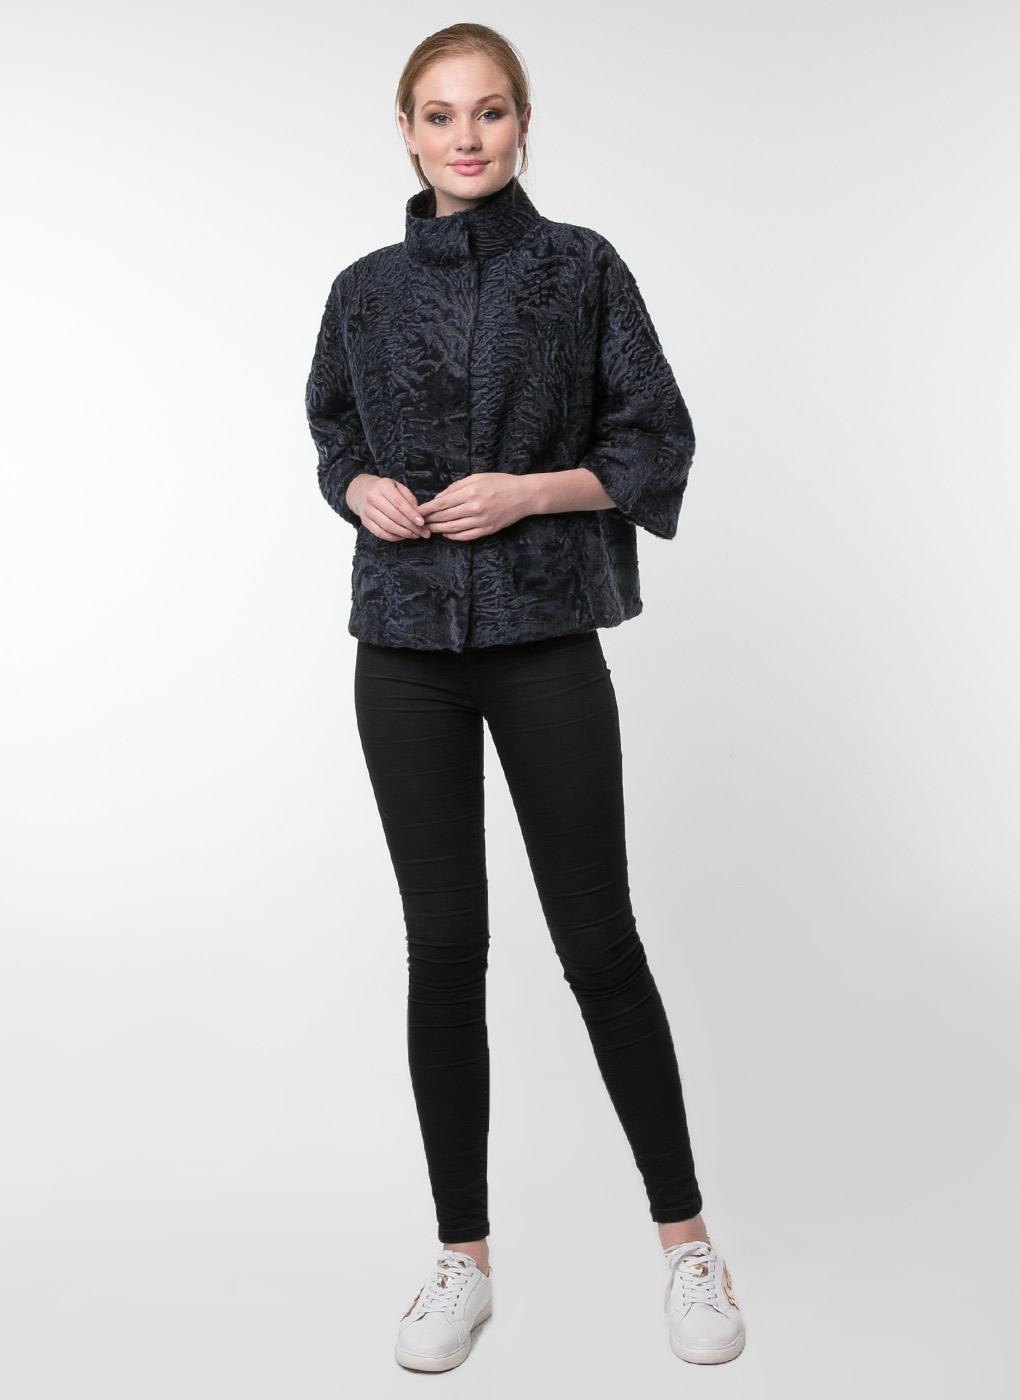 Куртка из каракуля Магдалена 01, Asian furs фото